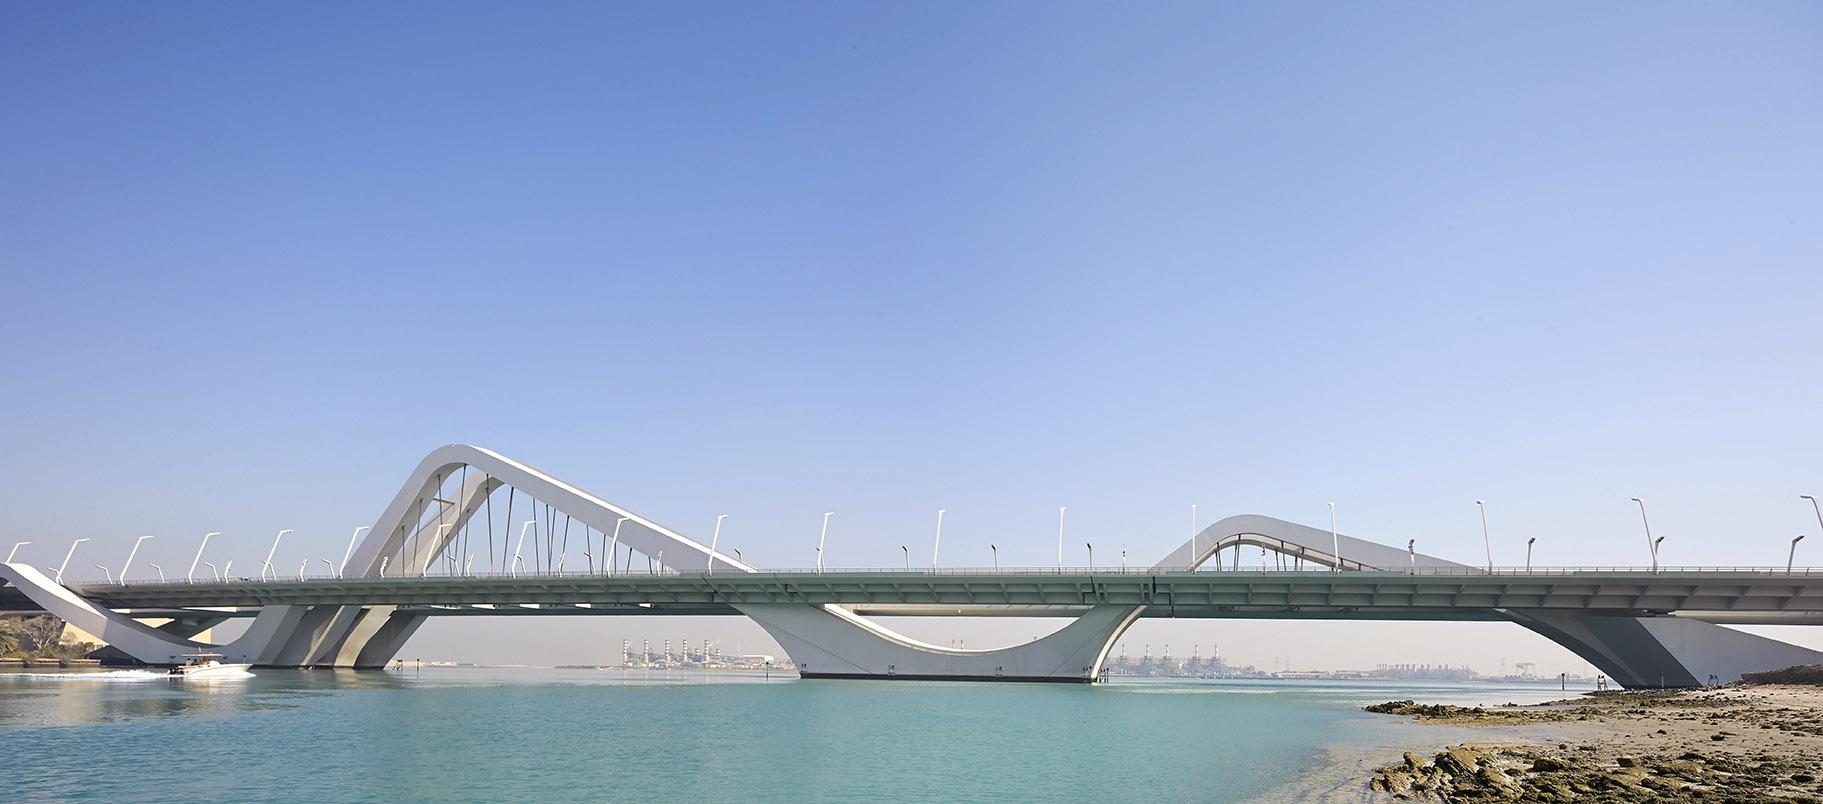 Sheikh Zayed Bridge in Abu Dhabi